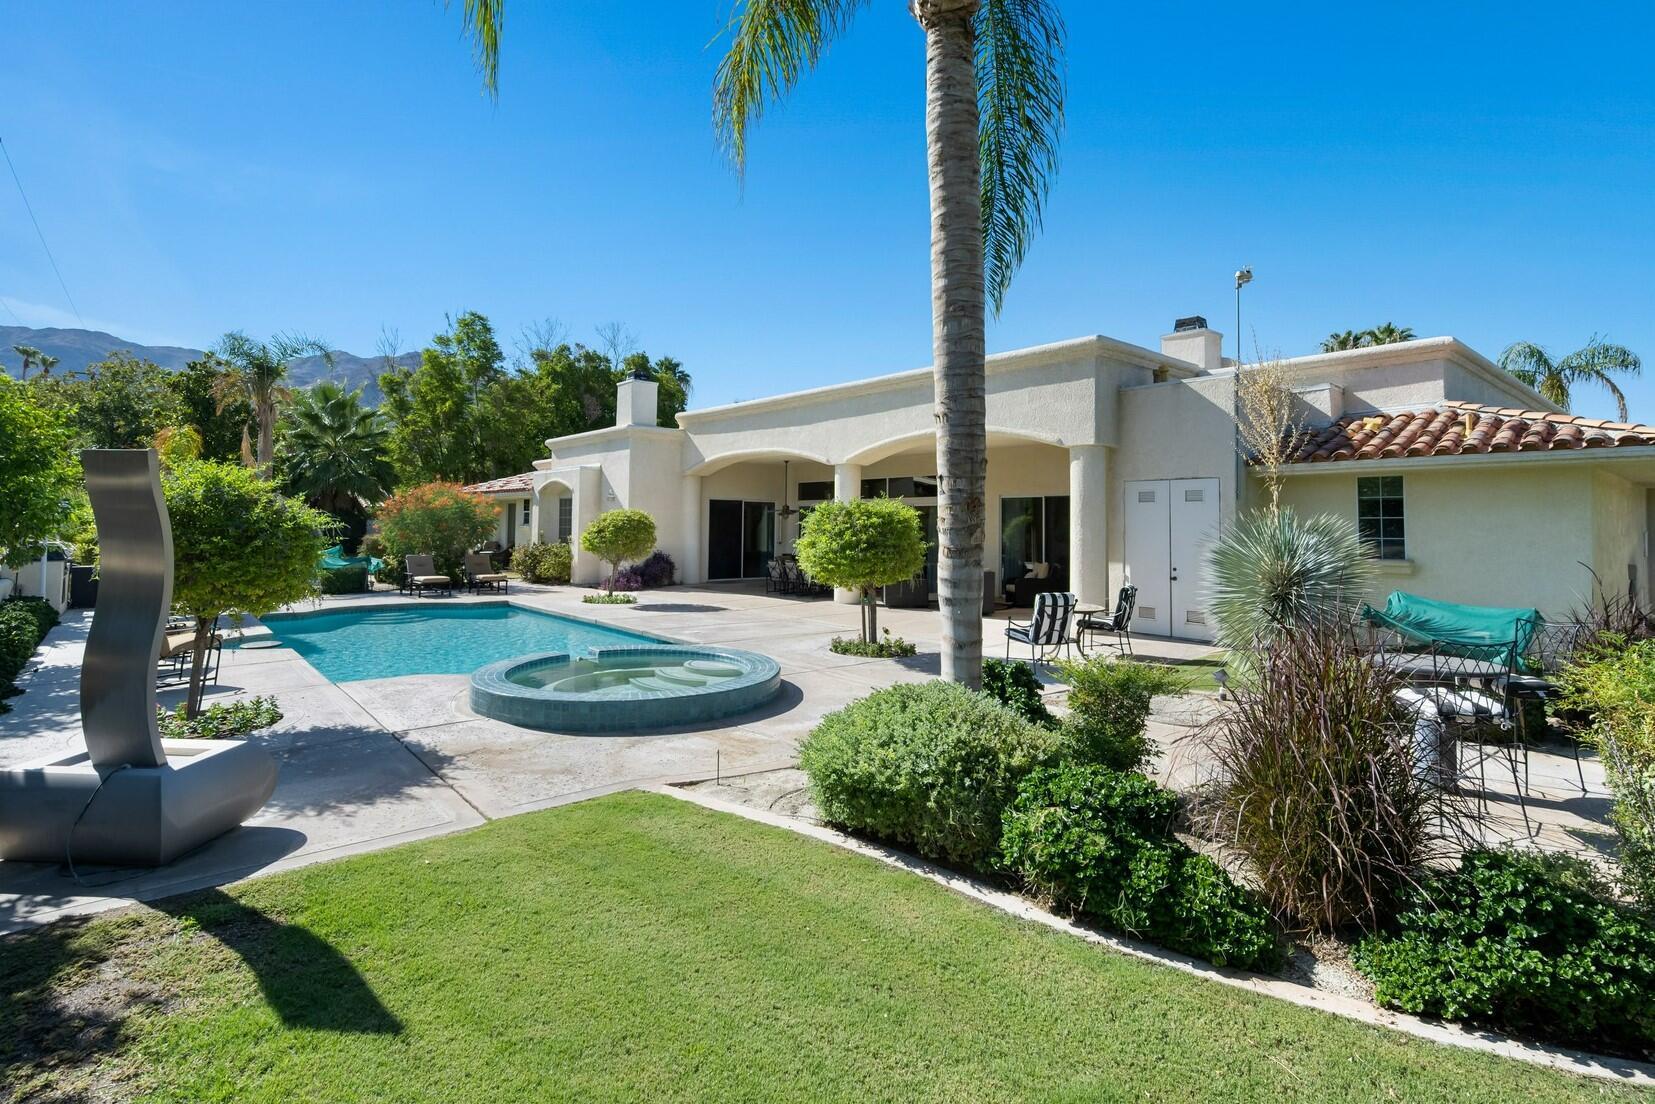 Photo of 72925 Grapevine Street, Palm Desert, CA 92260